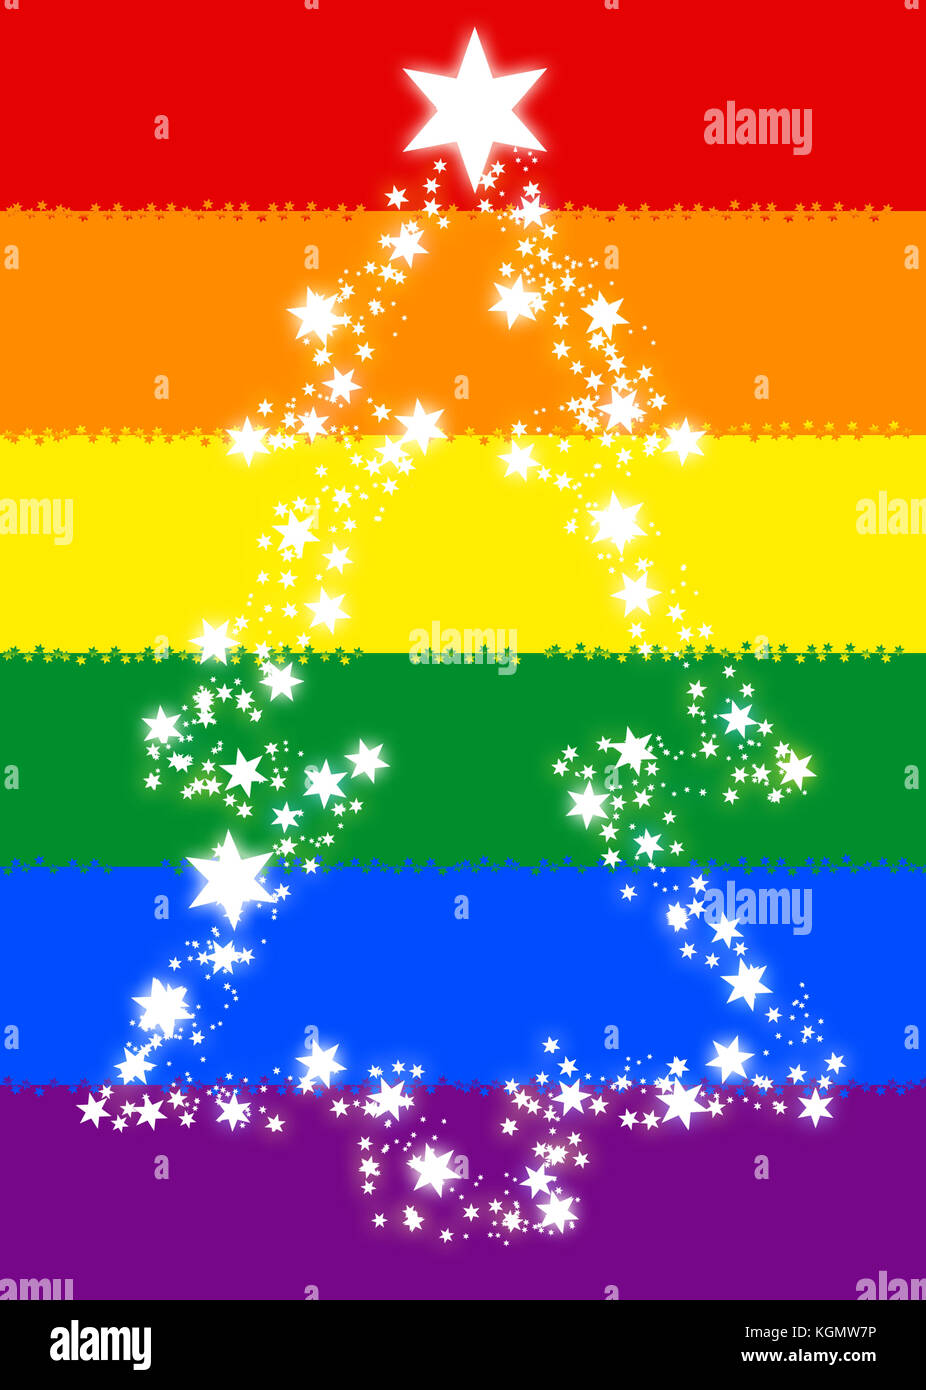 holiday rainbow flag gay interest gay pride christmas stock image - Gay Pride Christmas Decorations